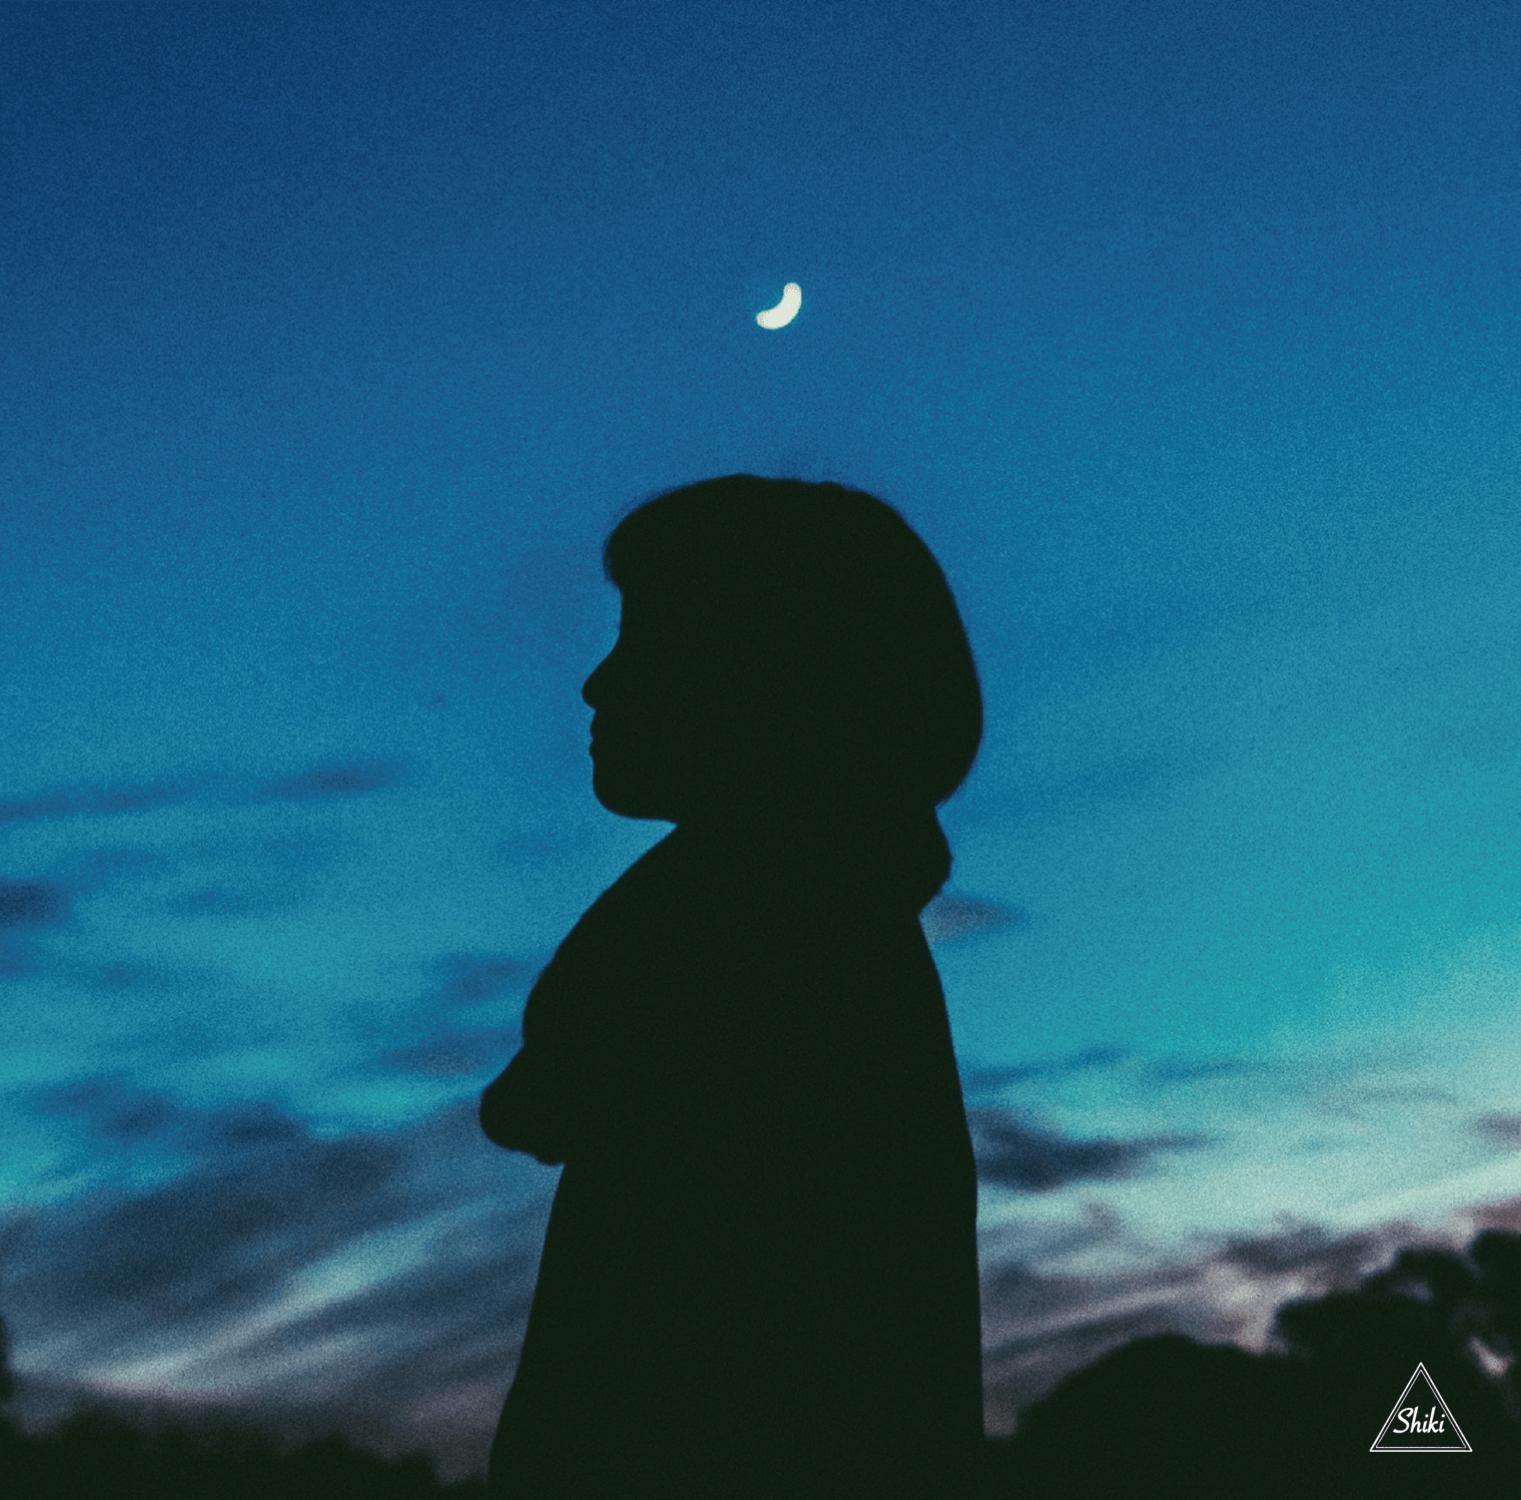 Shiki_AwakuAoi-feat.-野崎りこん-_-Melody-of-life